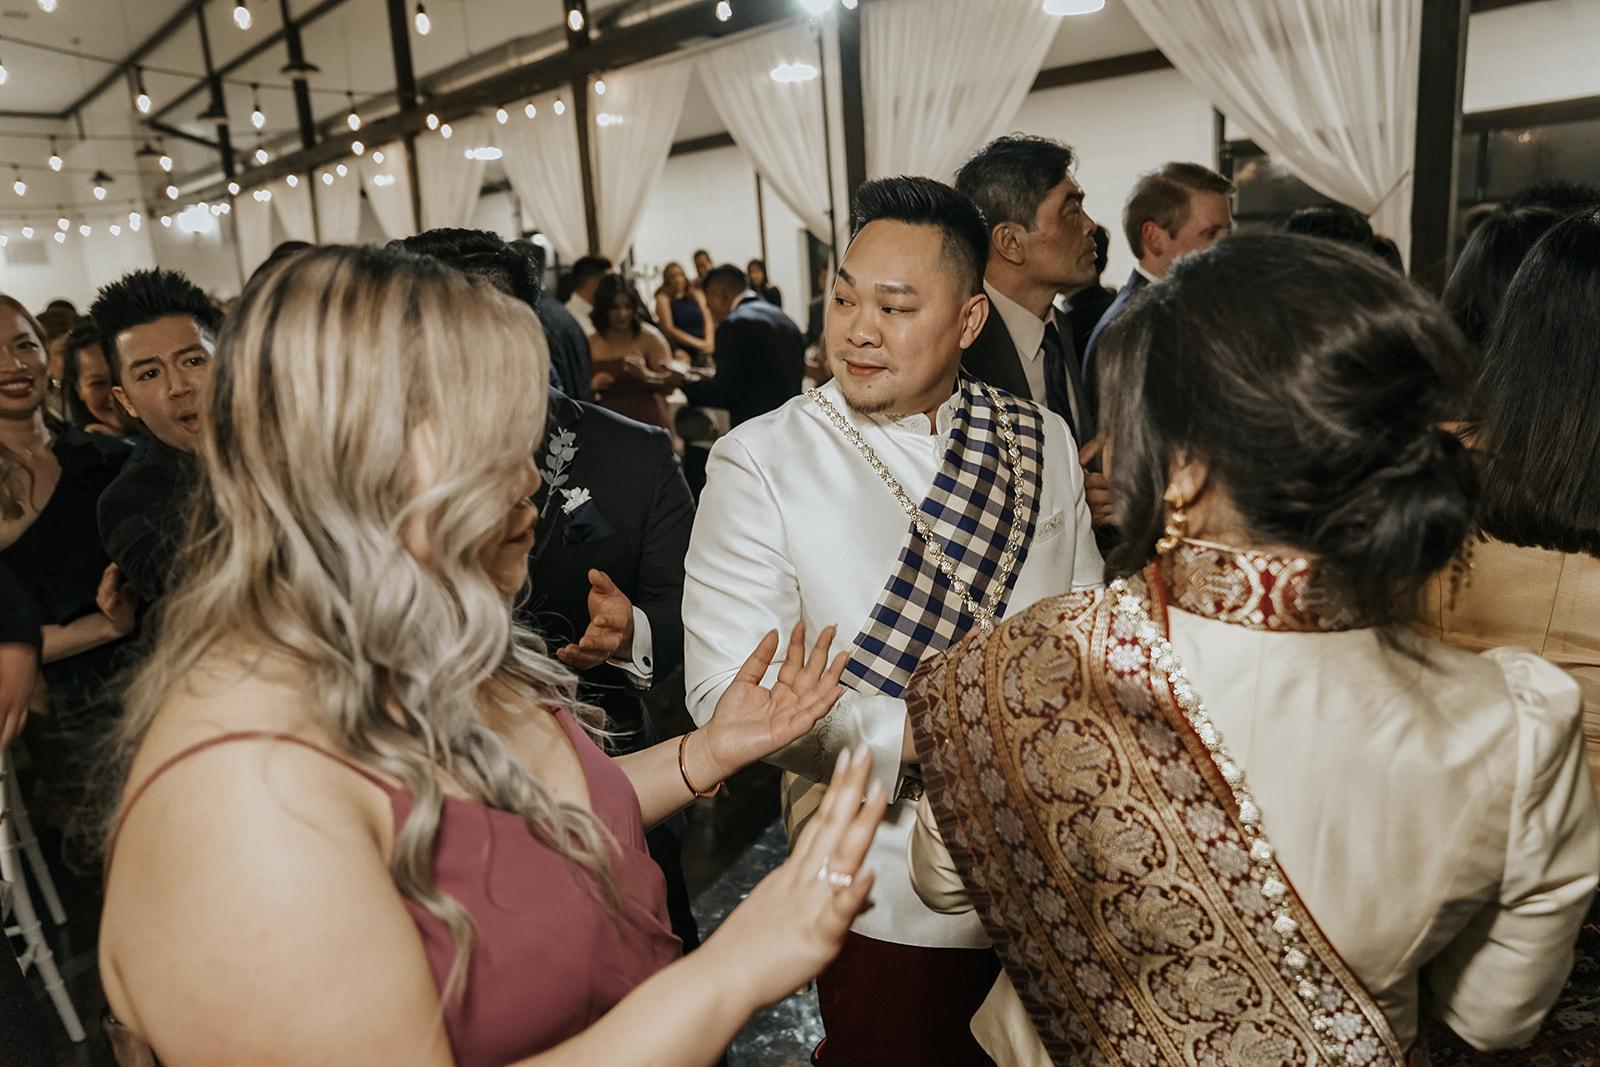 Bixby Tulsa White Barn Wedding Venues 32a.jpg